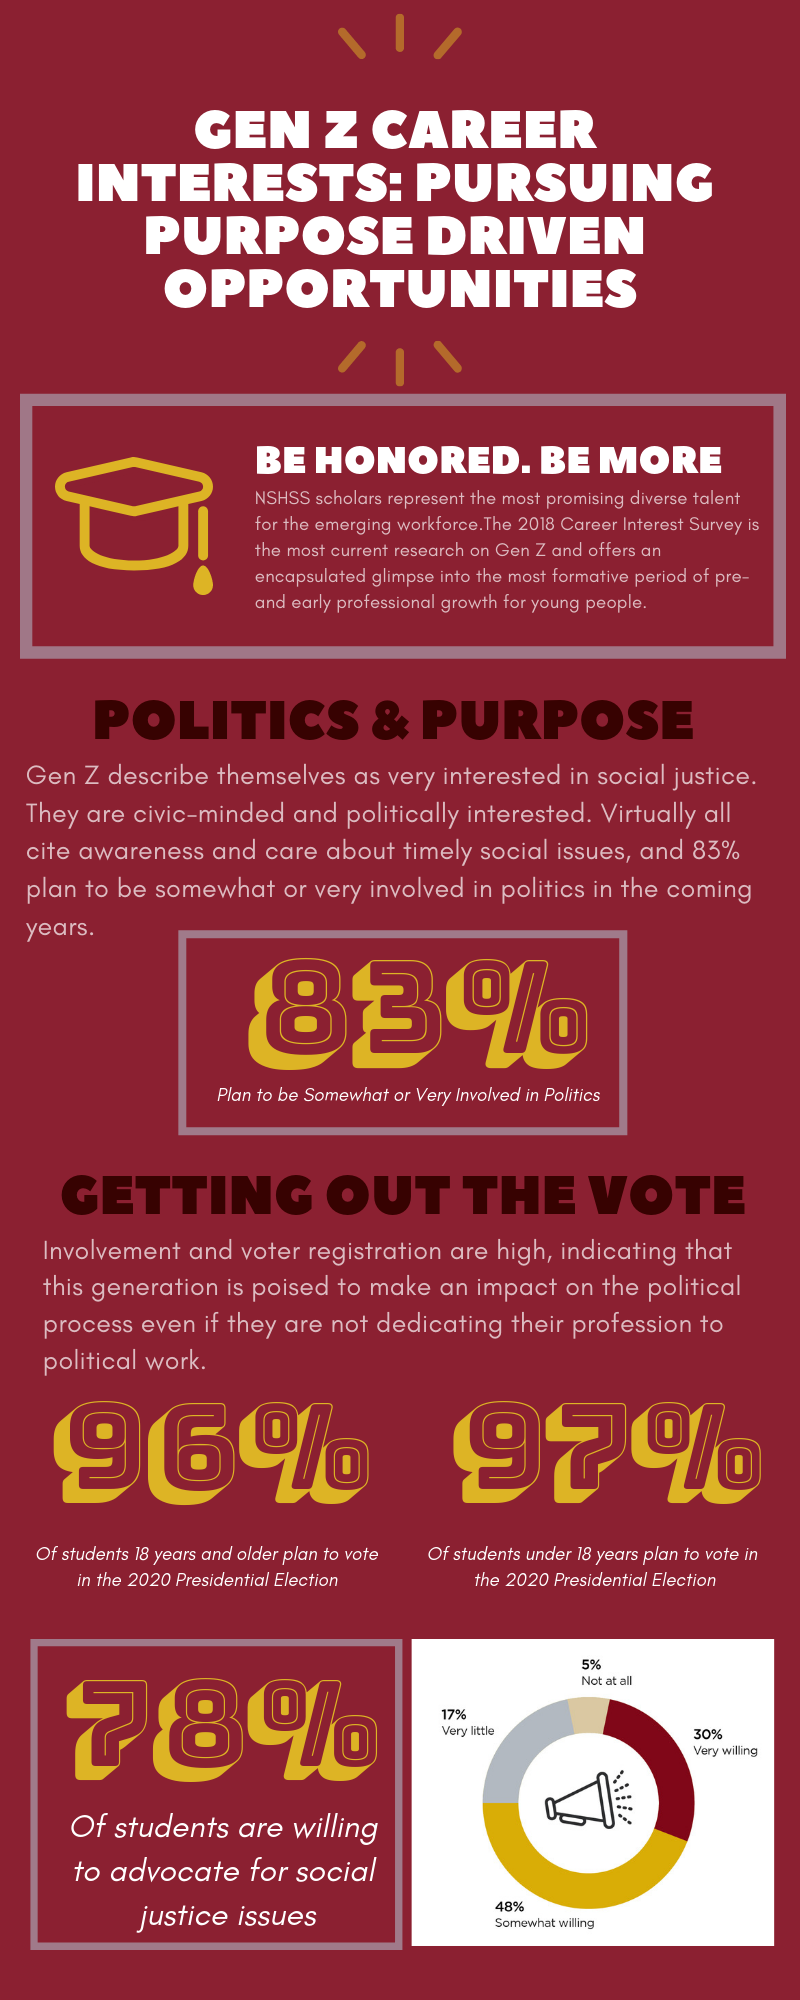 NSHSS infographic